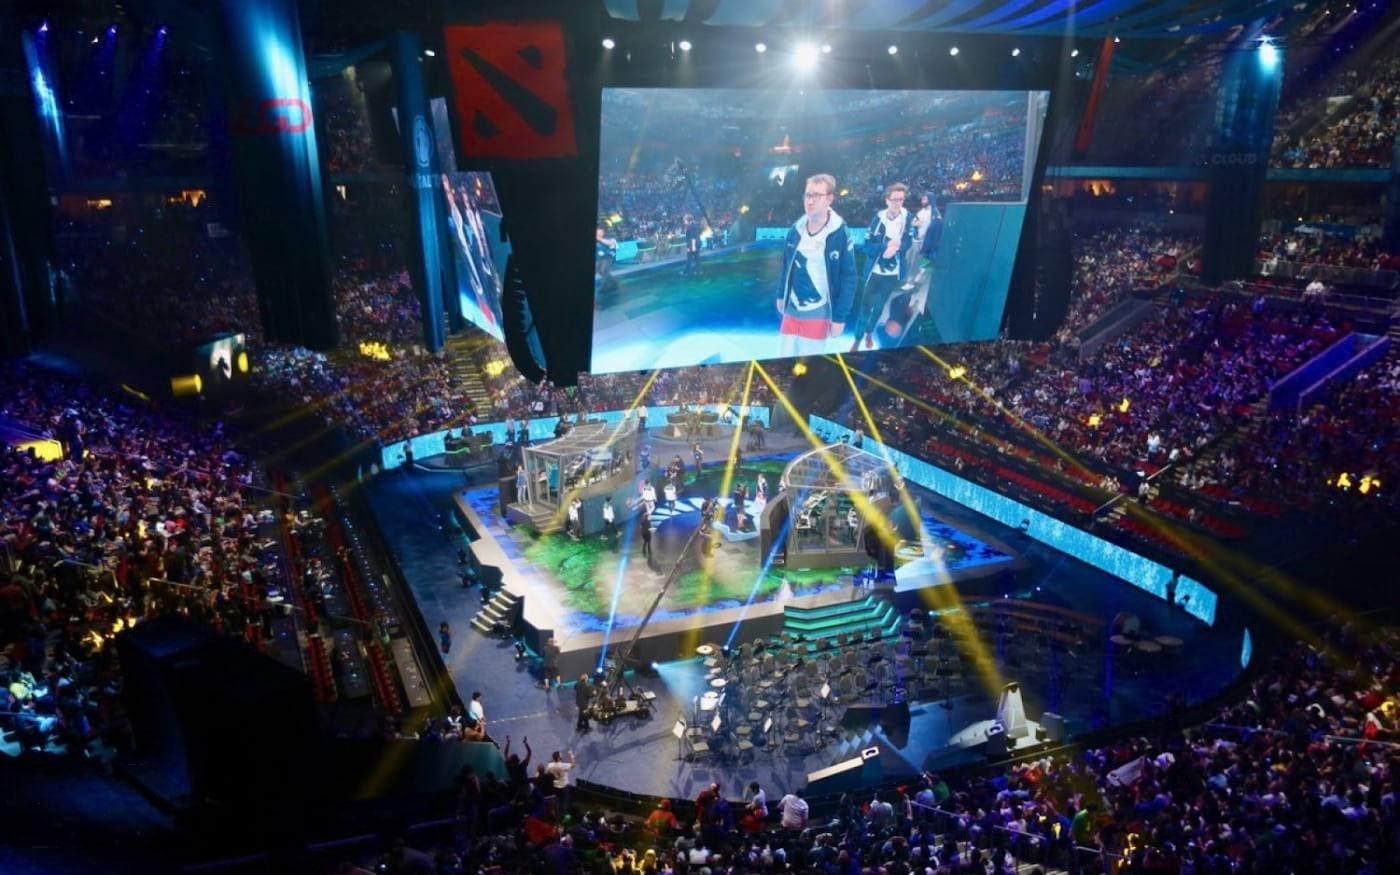 DotA 2: The International 2019 já tem prêmio de US$ 26,5 milhões